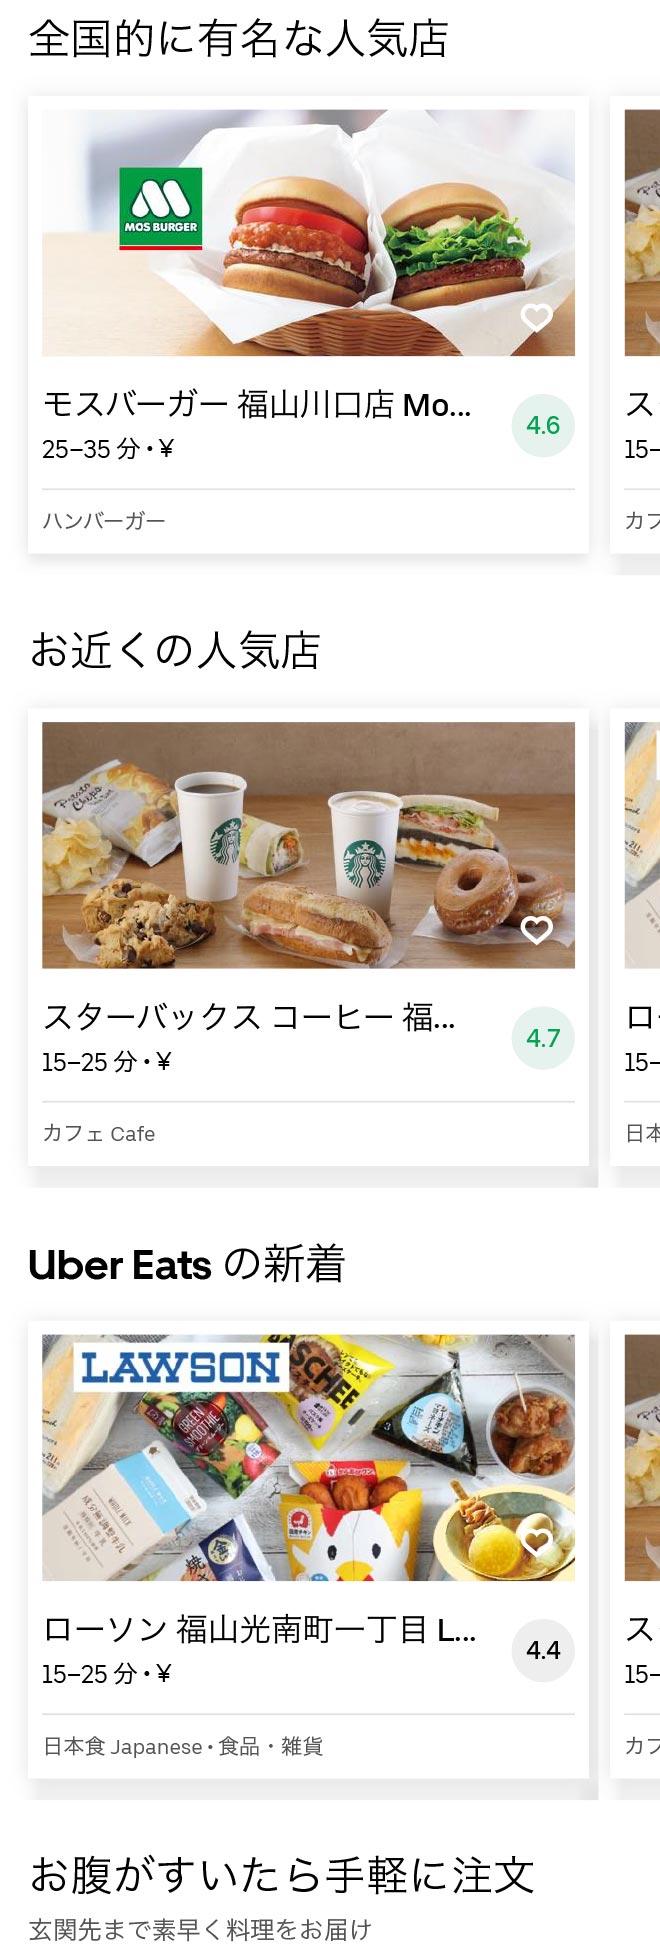 Fukuyama menu 2010 01